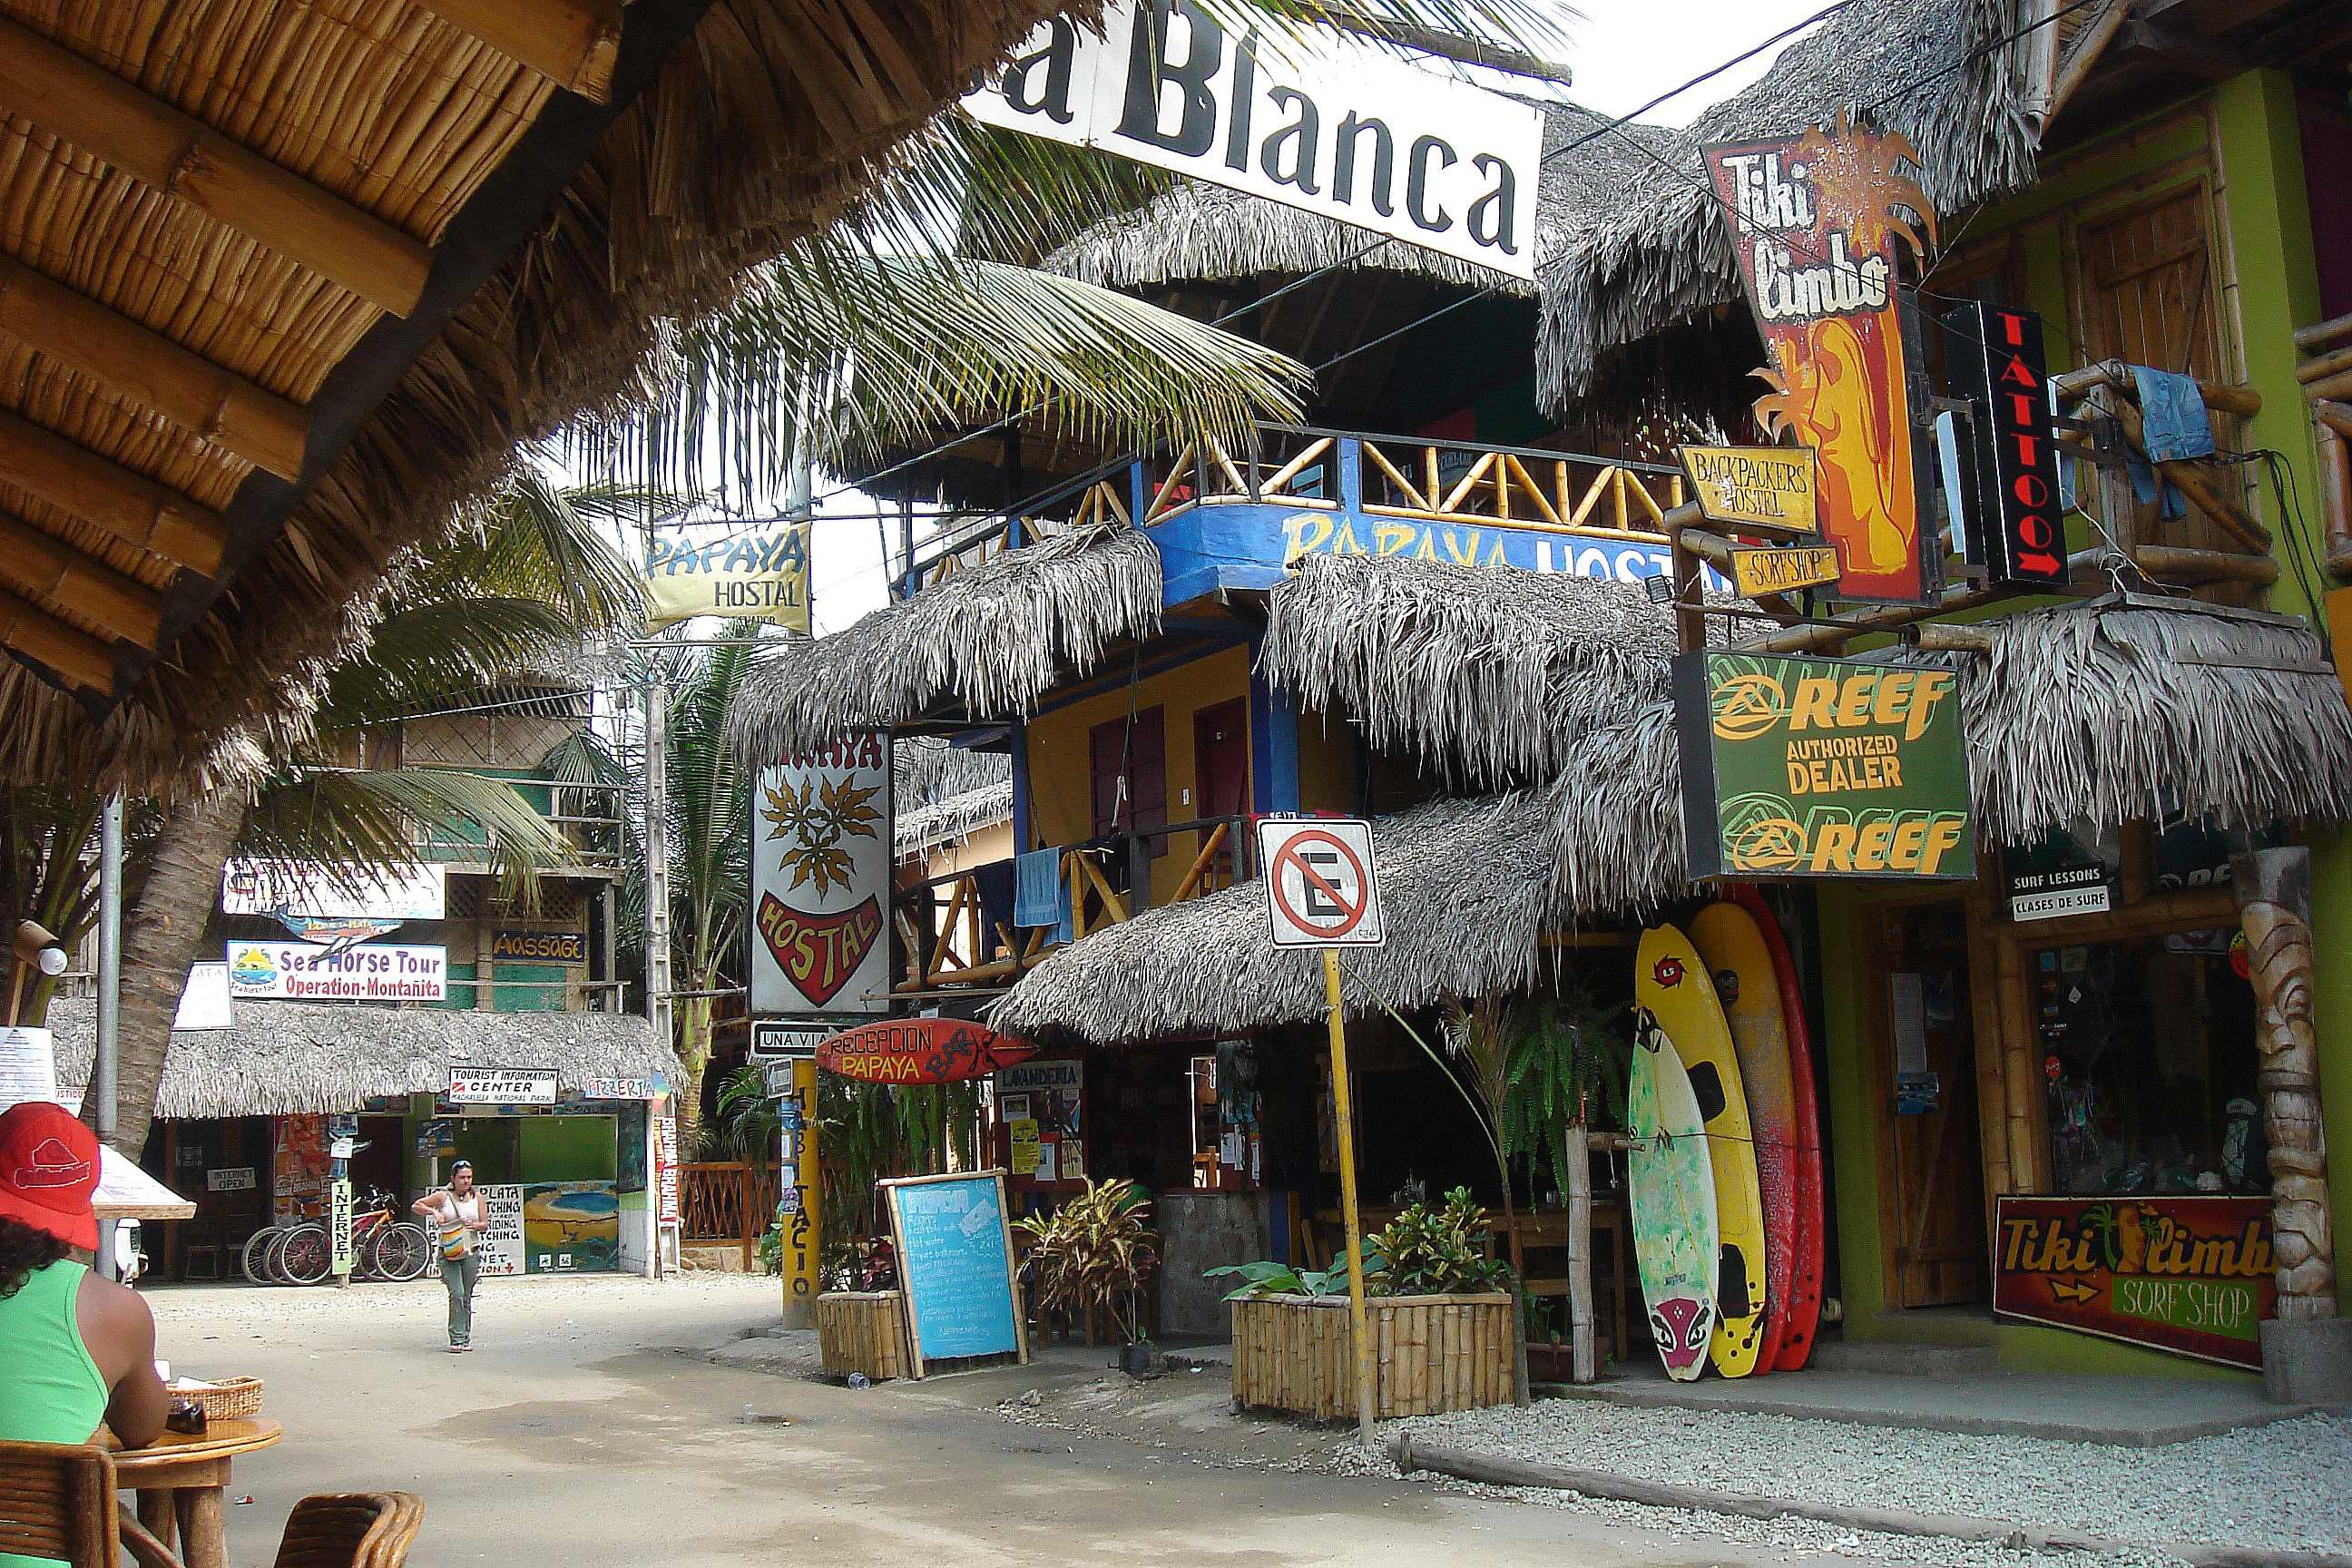 Turismo  Paquetes a Montaita  Ecuador  Amrica del Sur